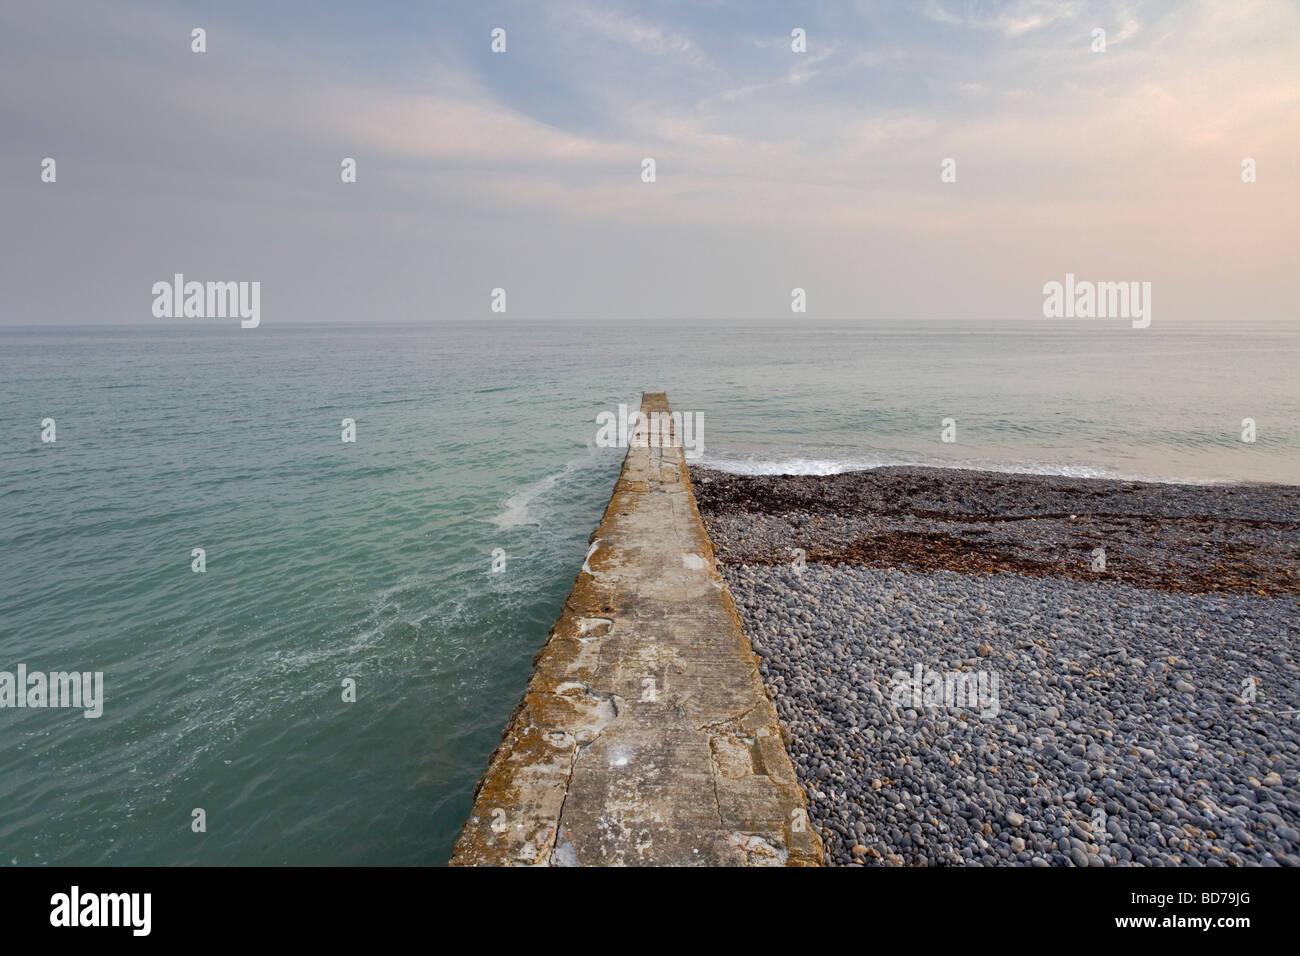 seascape with groyne - Stock Image